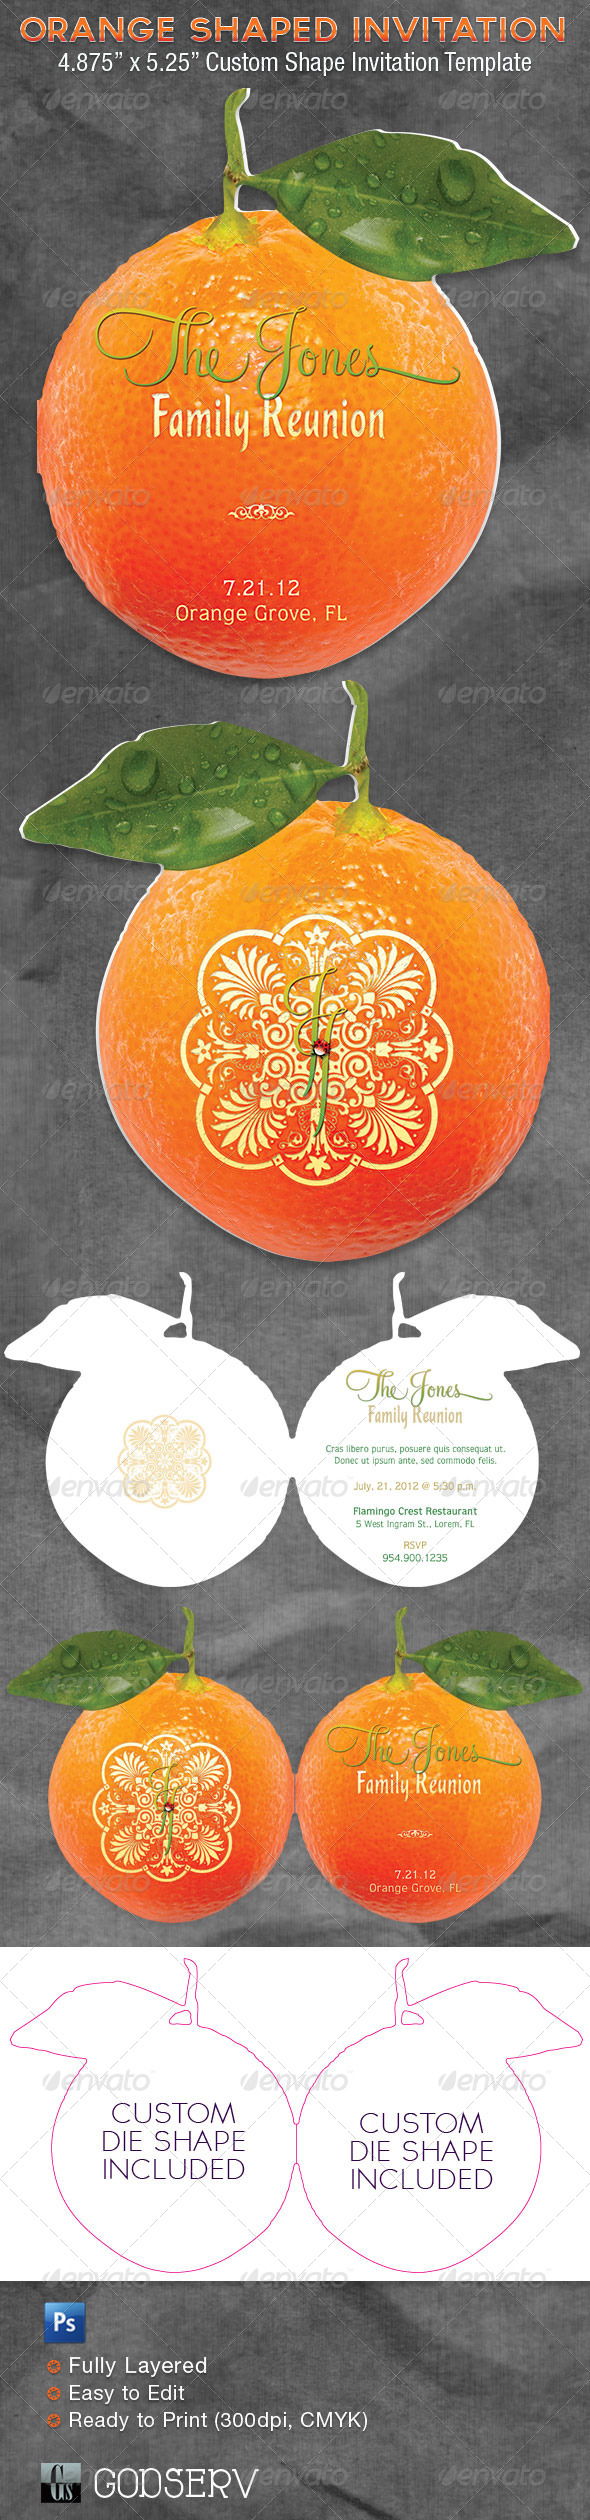 Orange Shaped Invitation Card Template